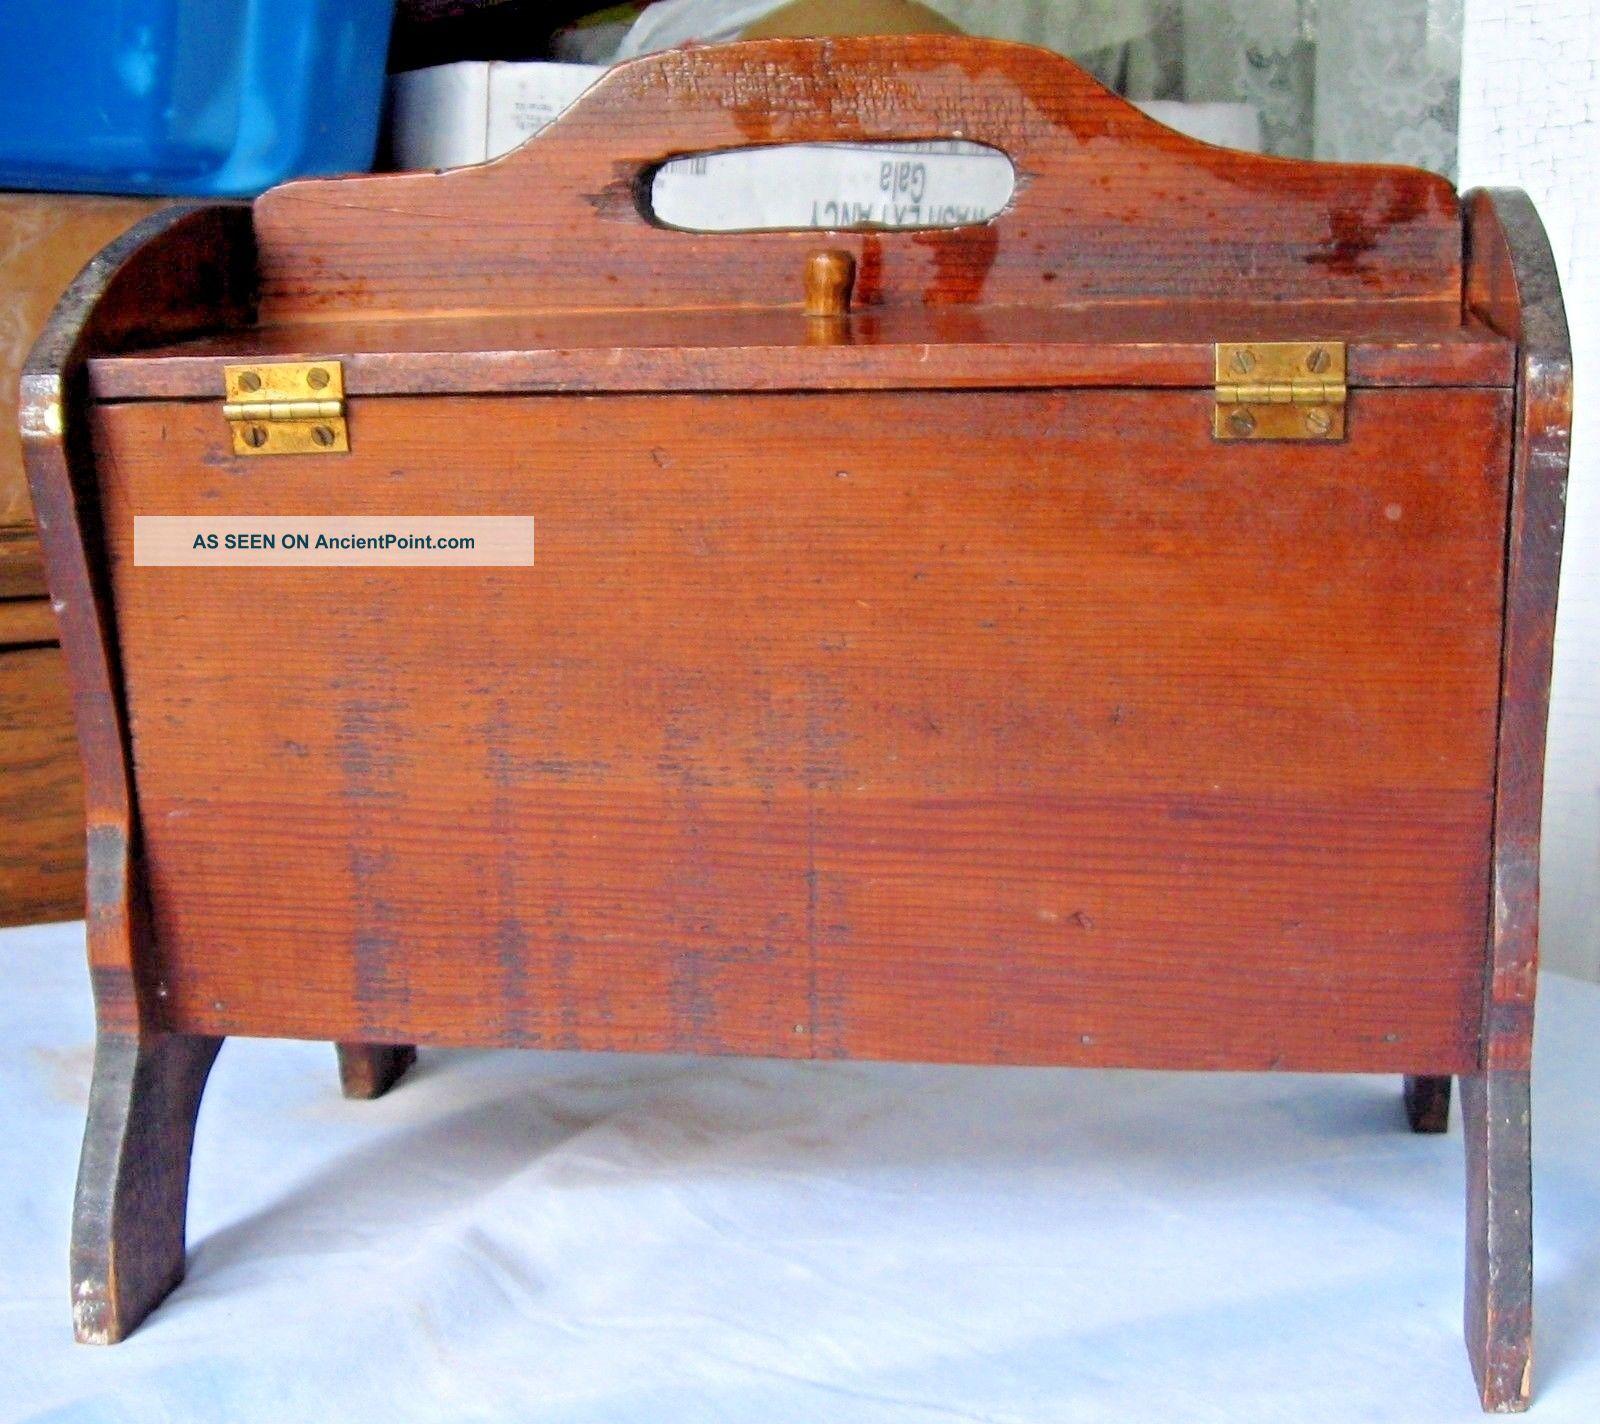 Vintage Wood Sewing Storage Box Flip Top 2 Lids Mending Tote Yarn Caddy W/handle Baskets & Boxes photo